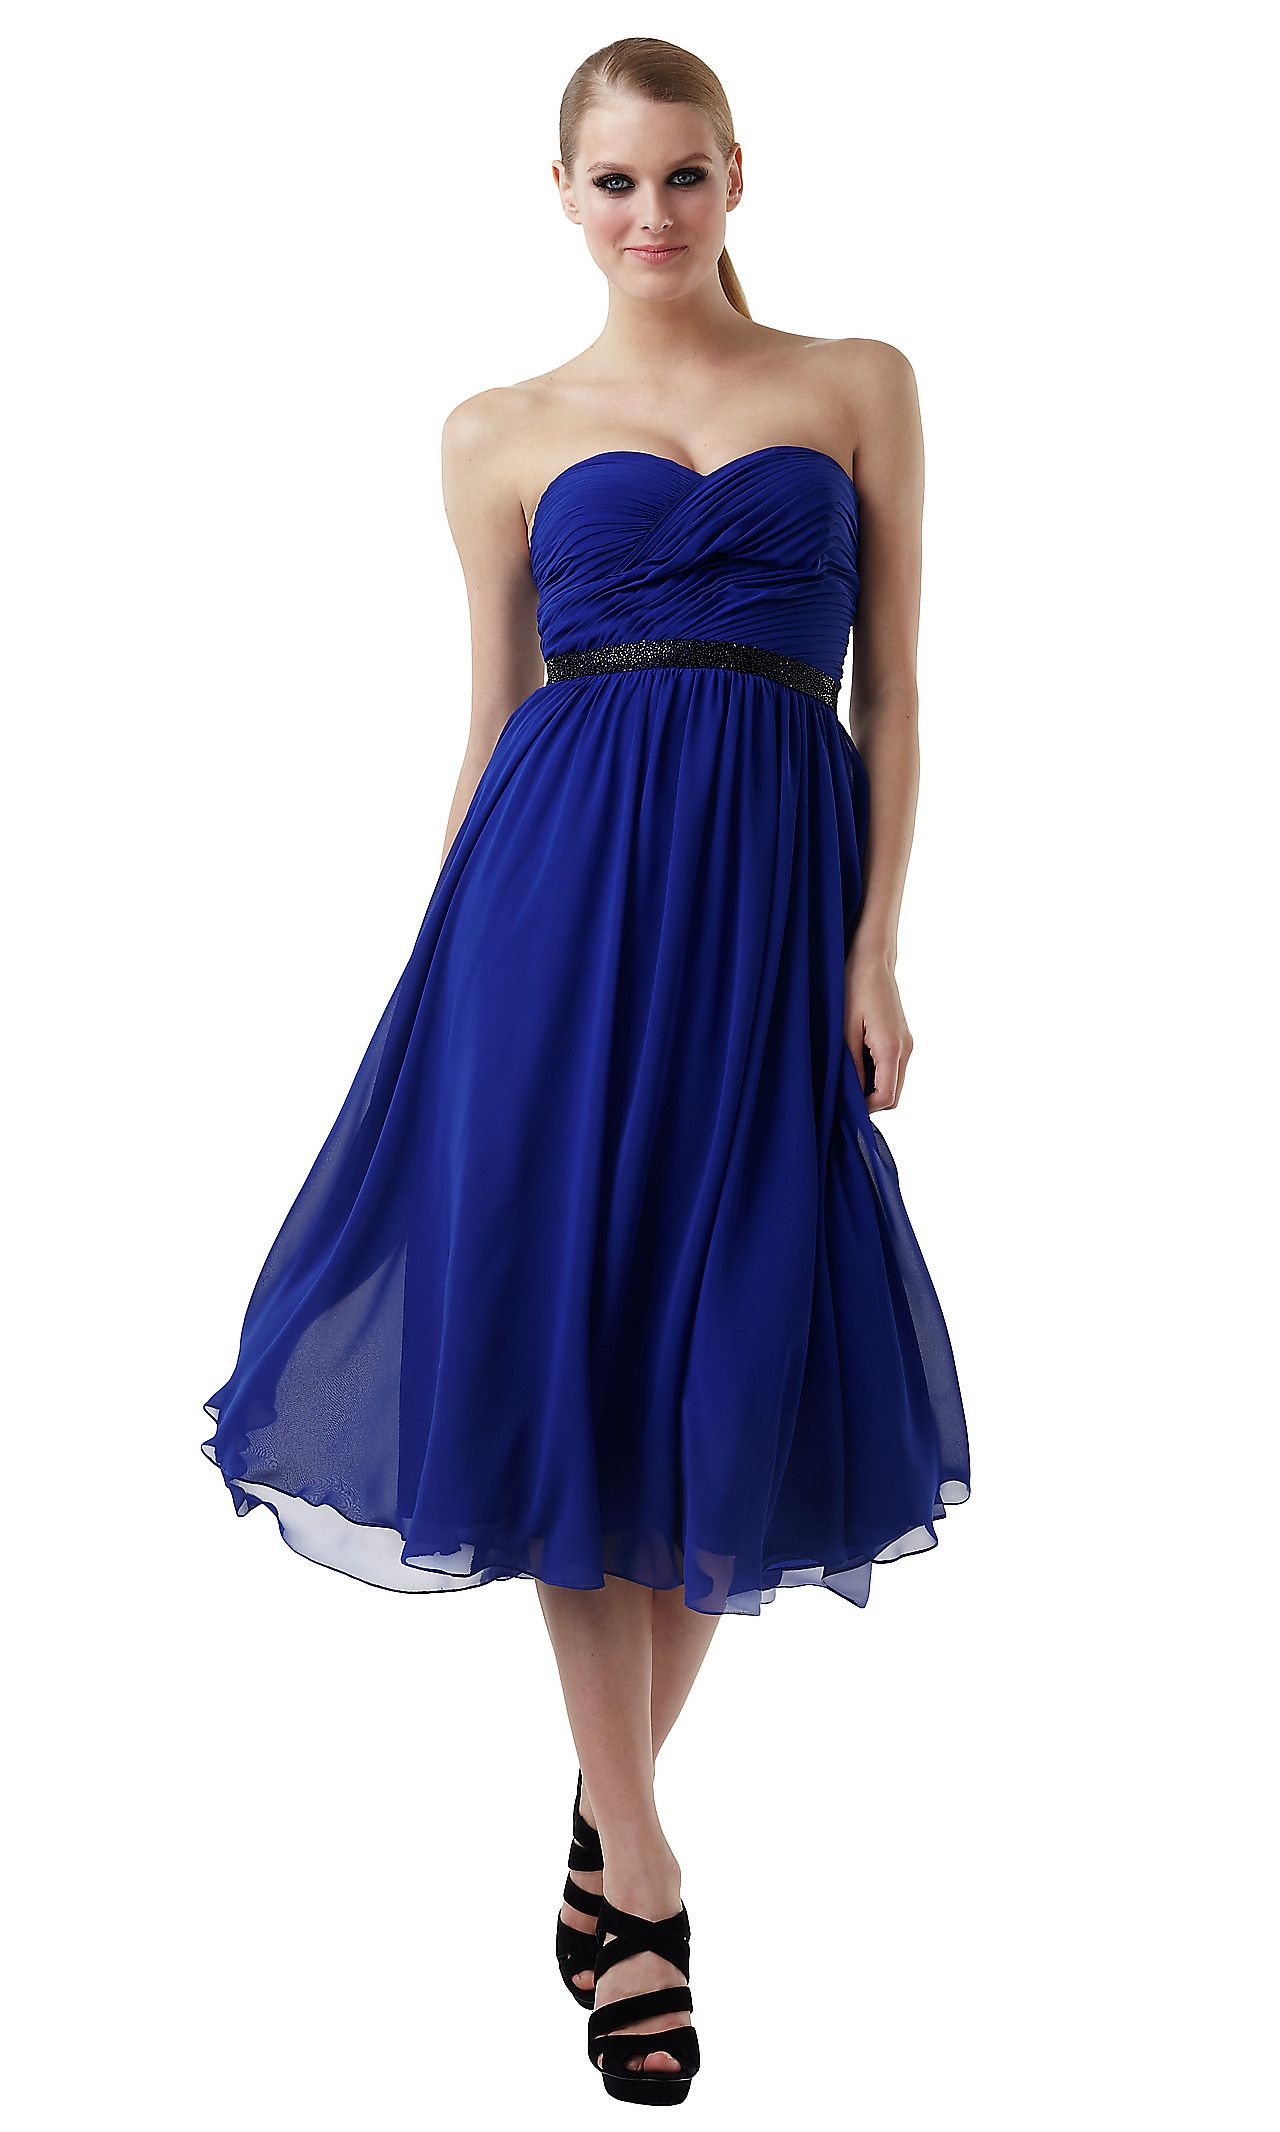 Bridesmaid dresses in royal blue navy top 50 royal blue tea length royal blue bridesmaid dress ombrellifo Gallery